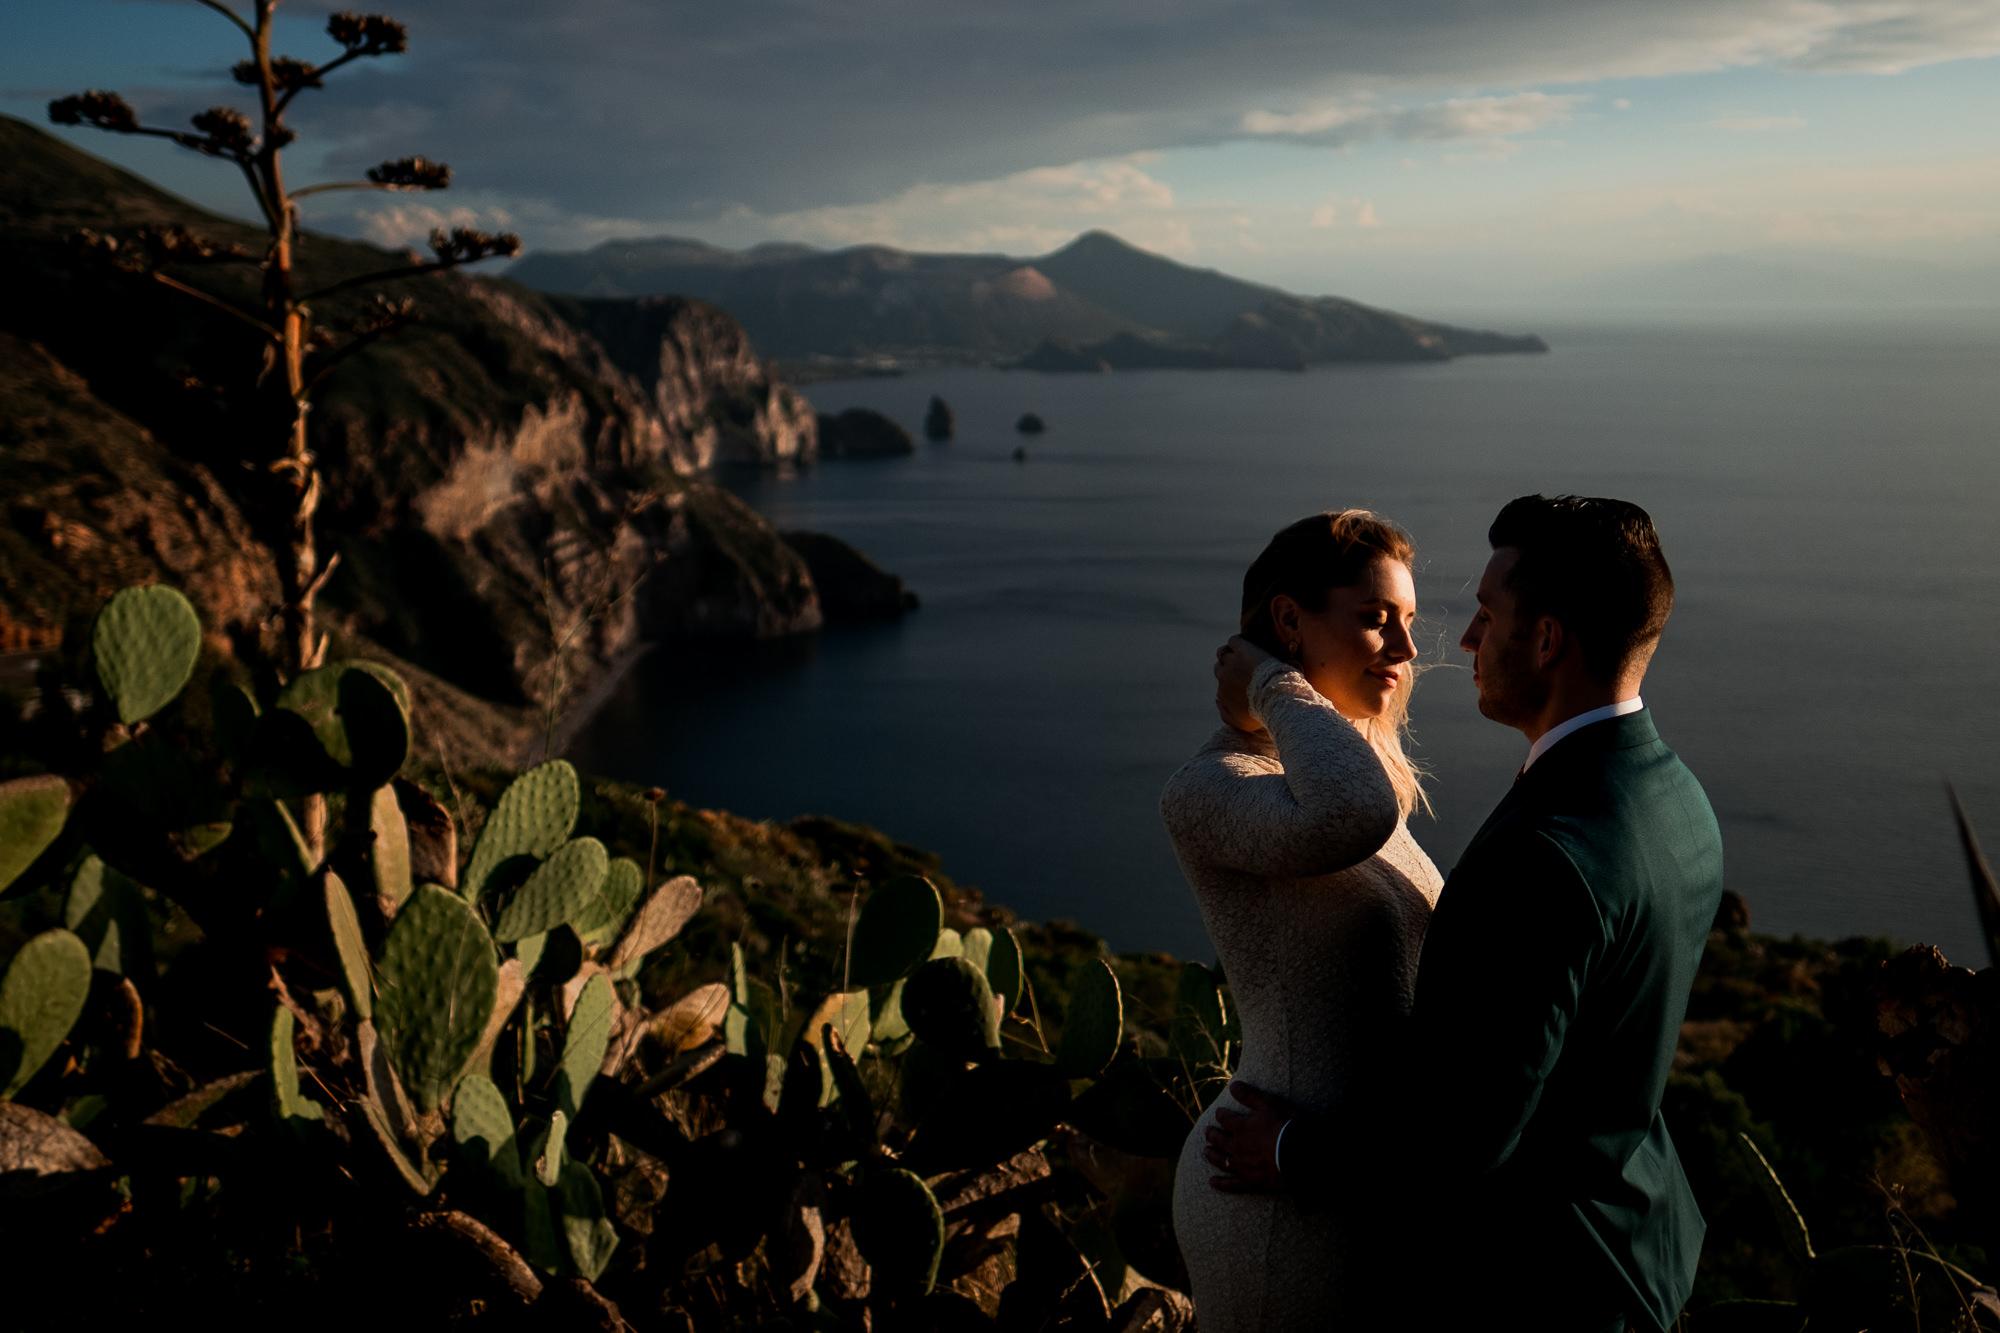 Couple portrait Wanaka New Zealand elopement photo by Nordica Photography